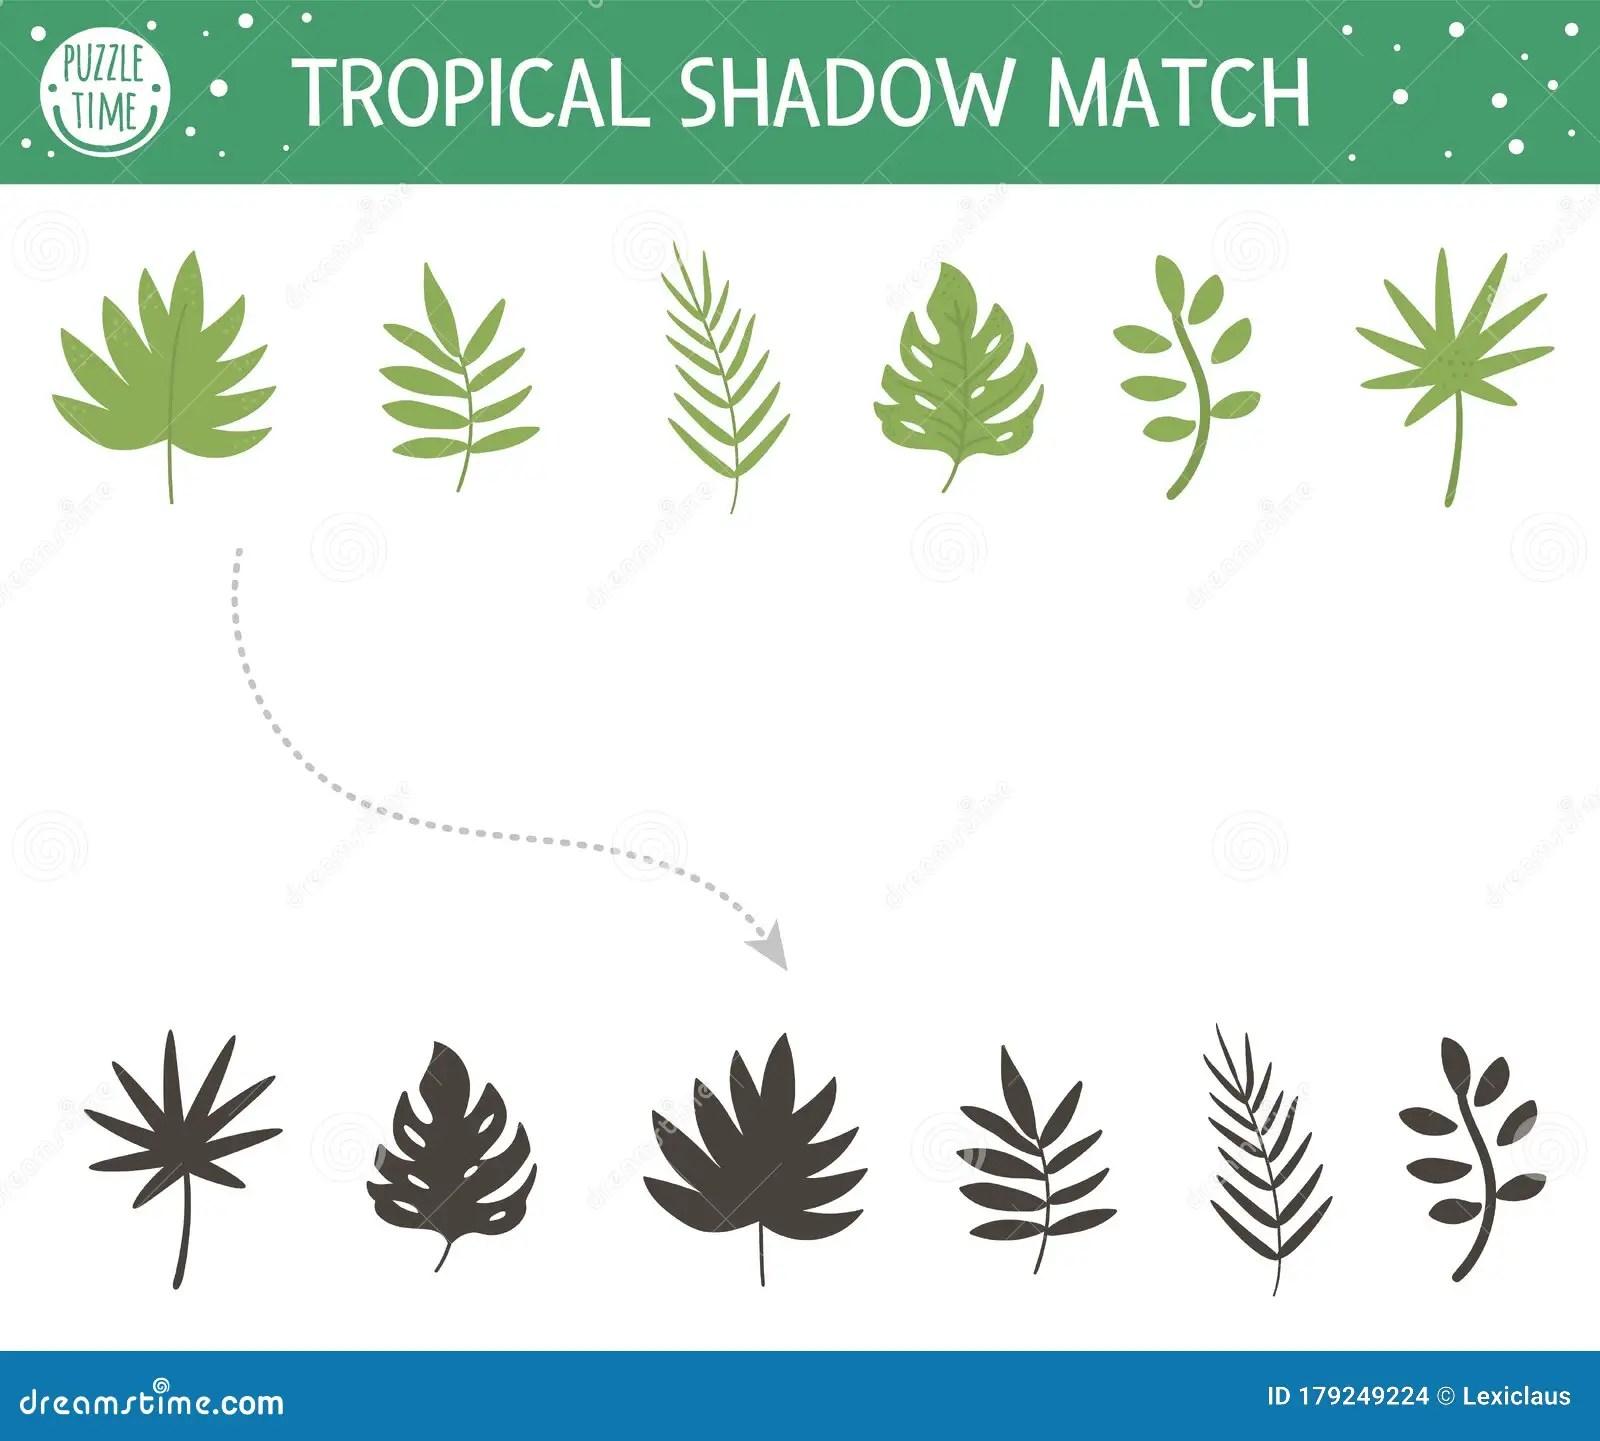 Tropical Shadow Matching Activity For Children Preschool